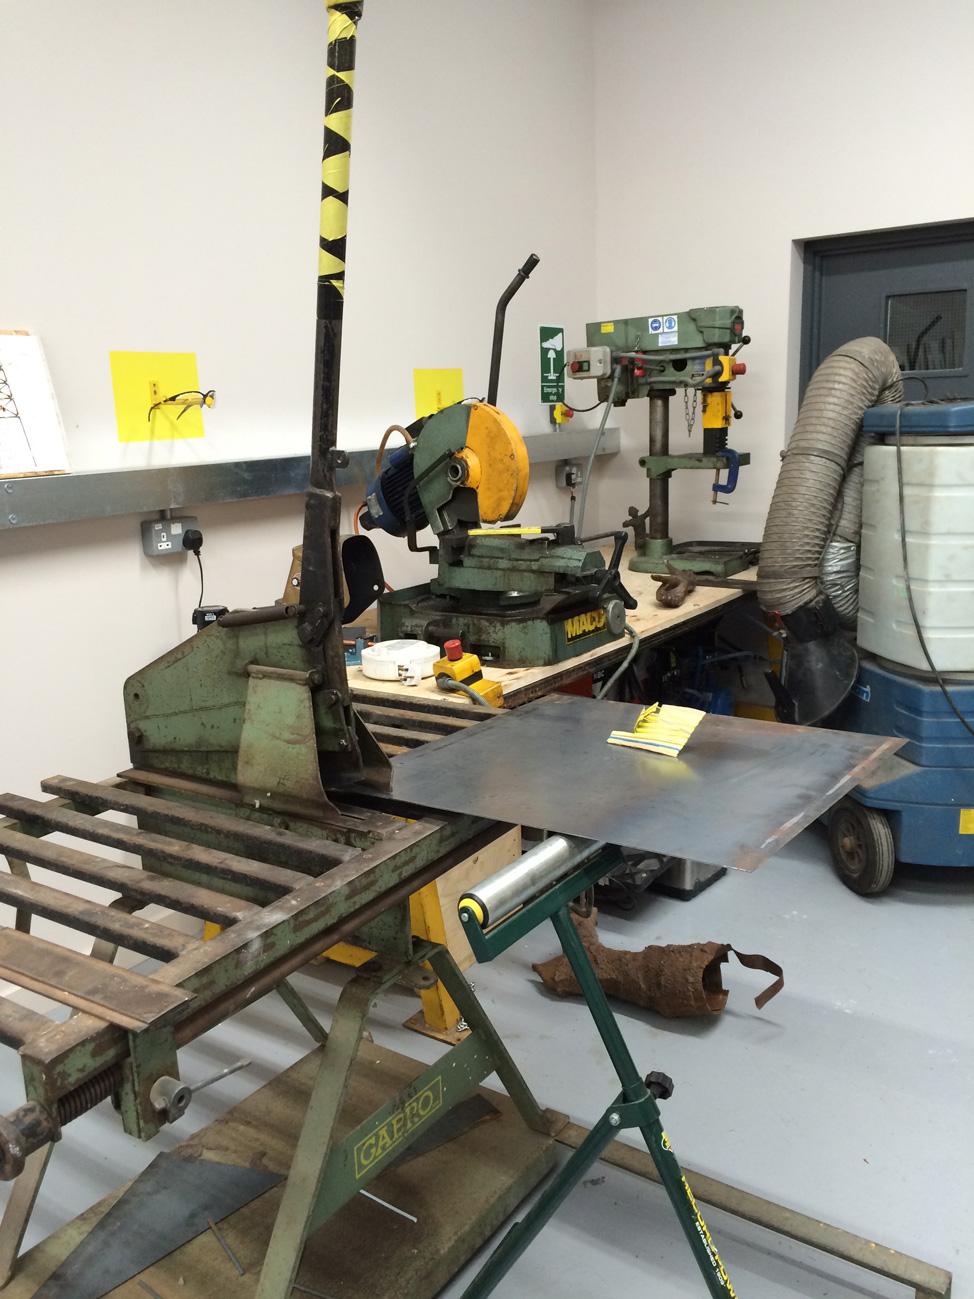 Guillotine to cut sheet metal